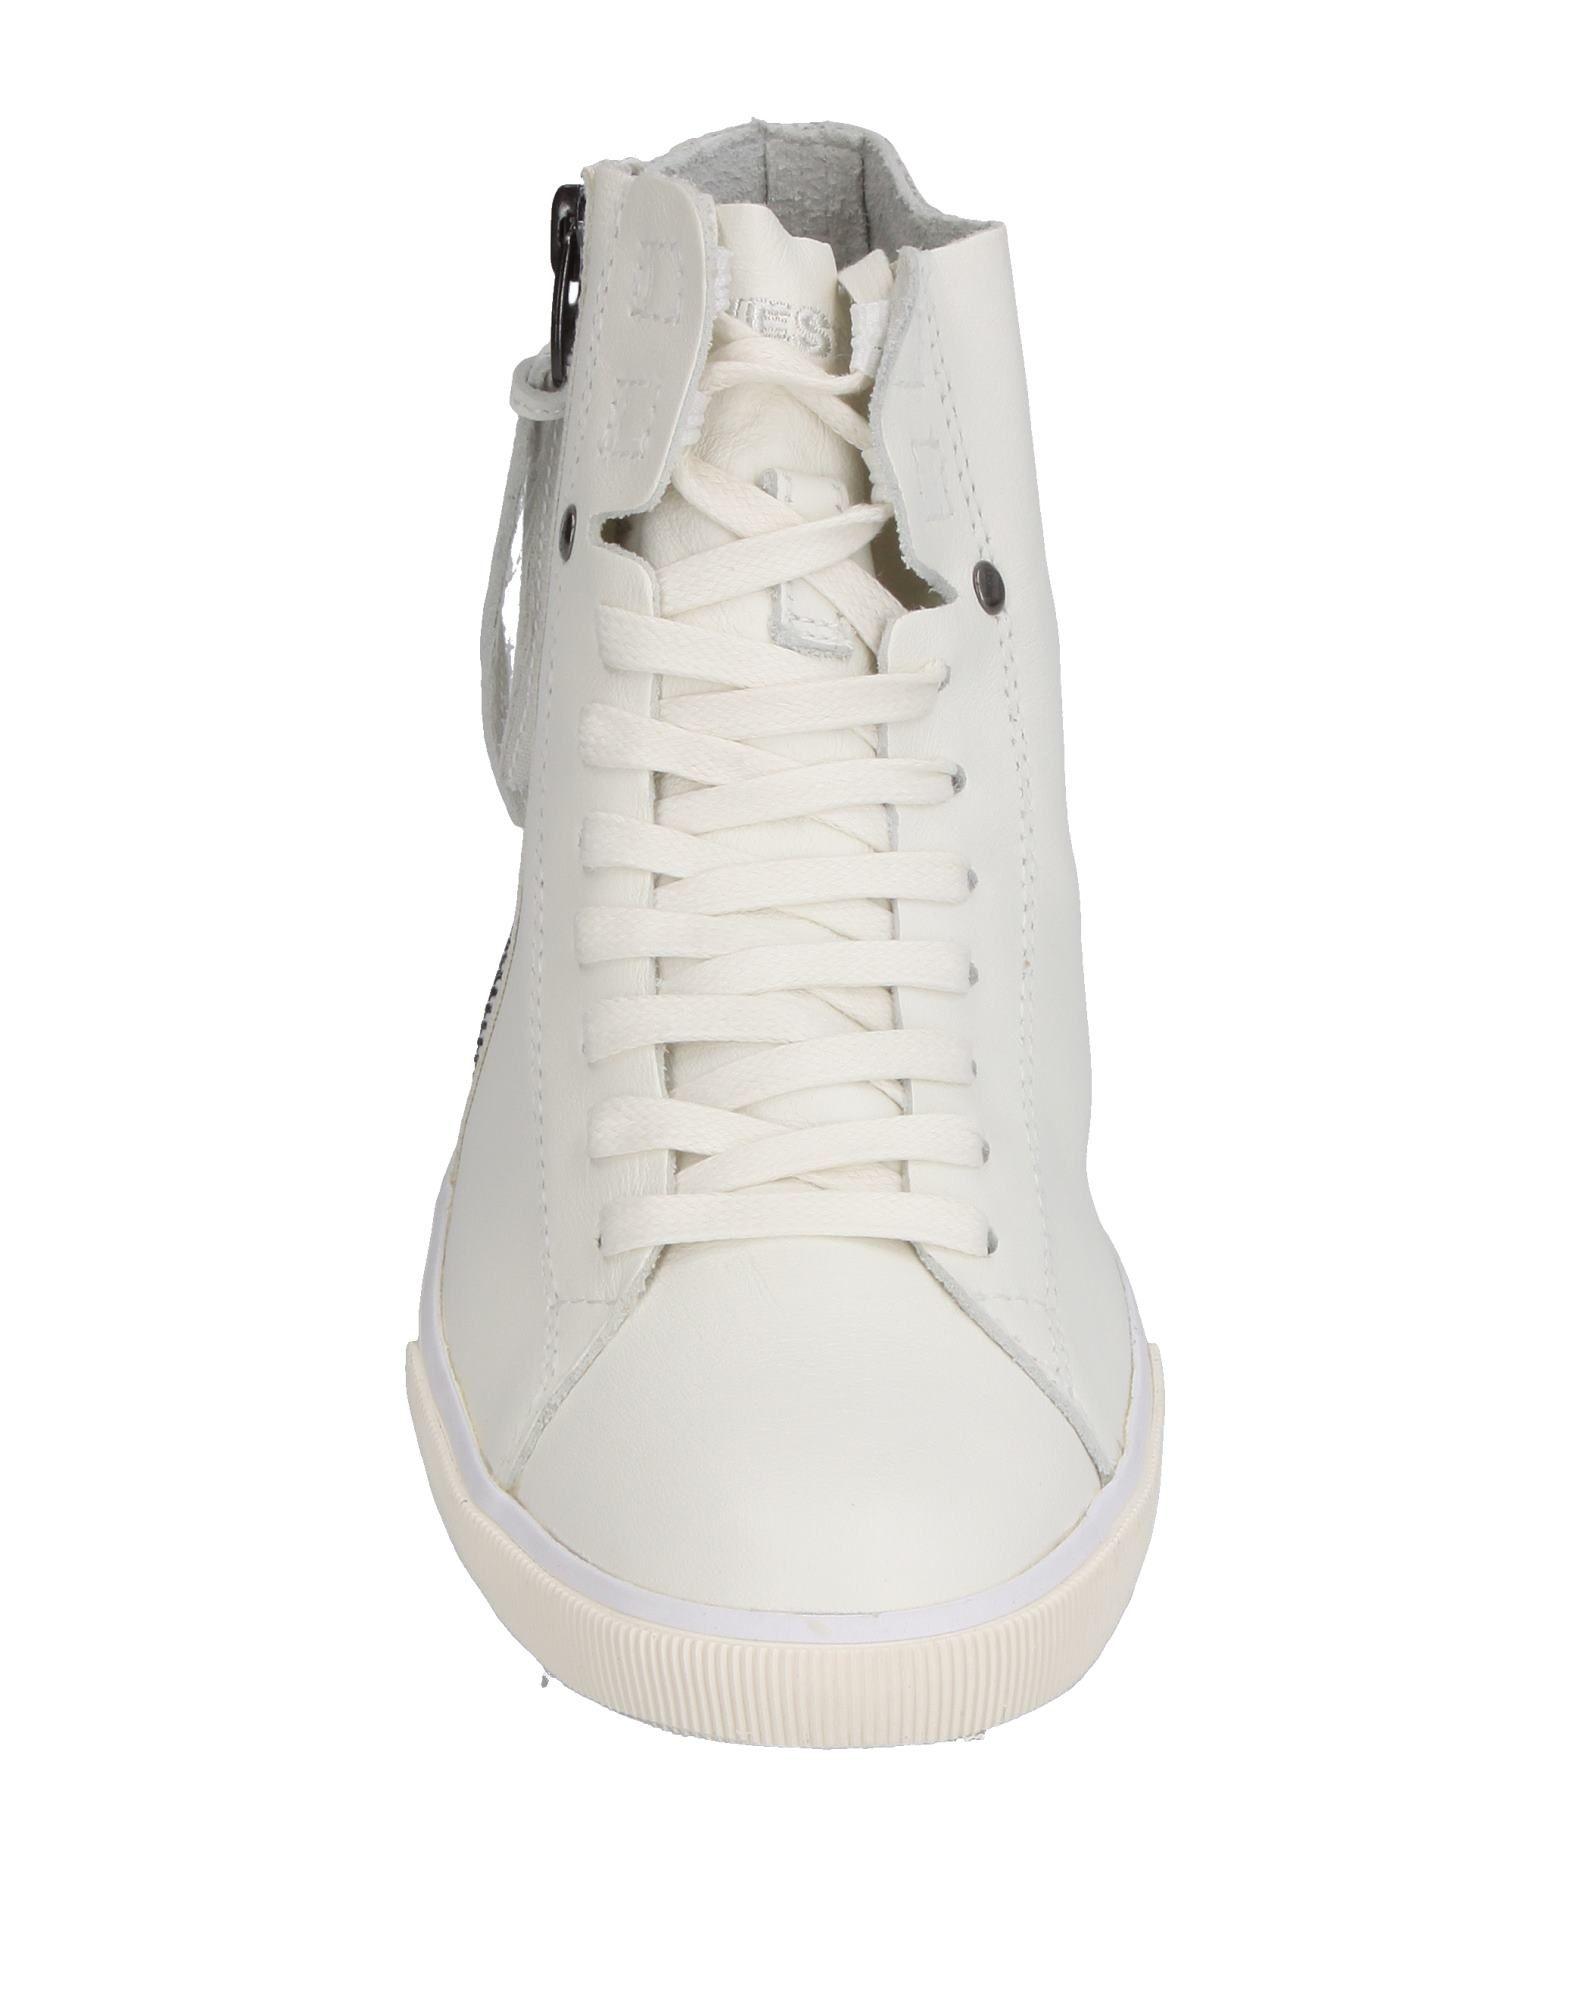 Diesel Gute Sneakers Damen  11201614CH Gute Diesel Qualität beliebte Schuhe da2d5d